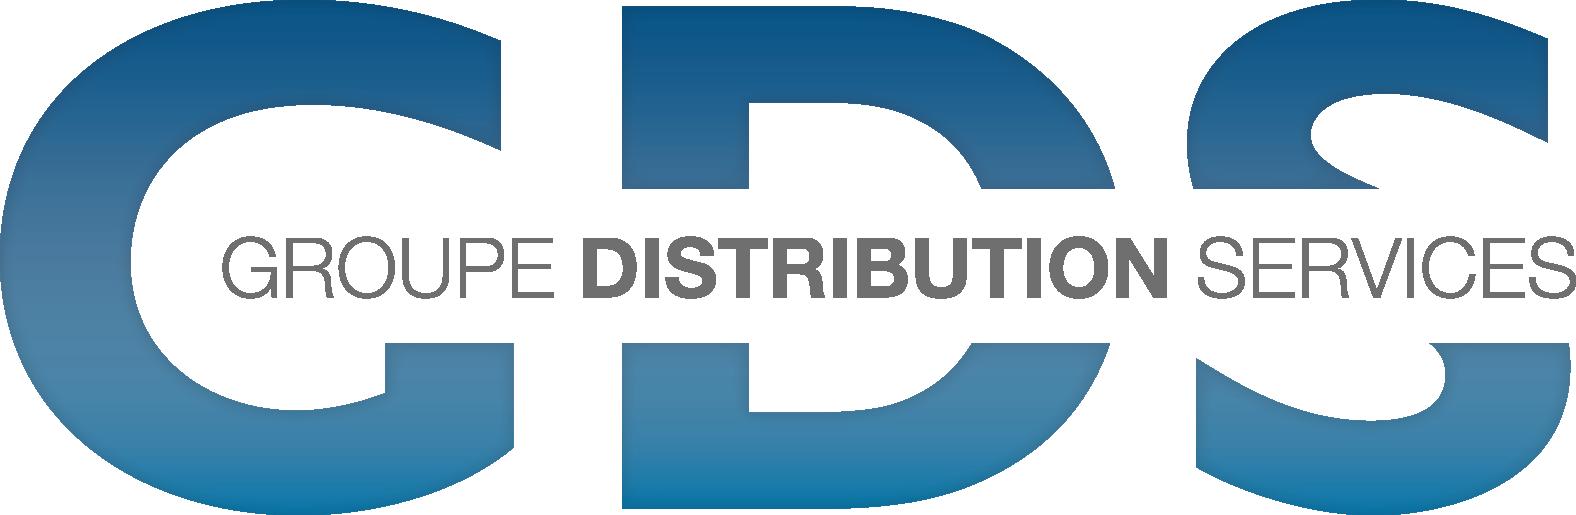 logo Groupe Distribution Services